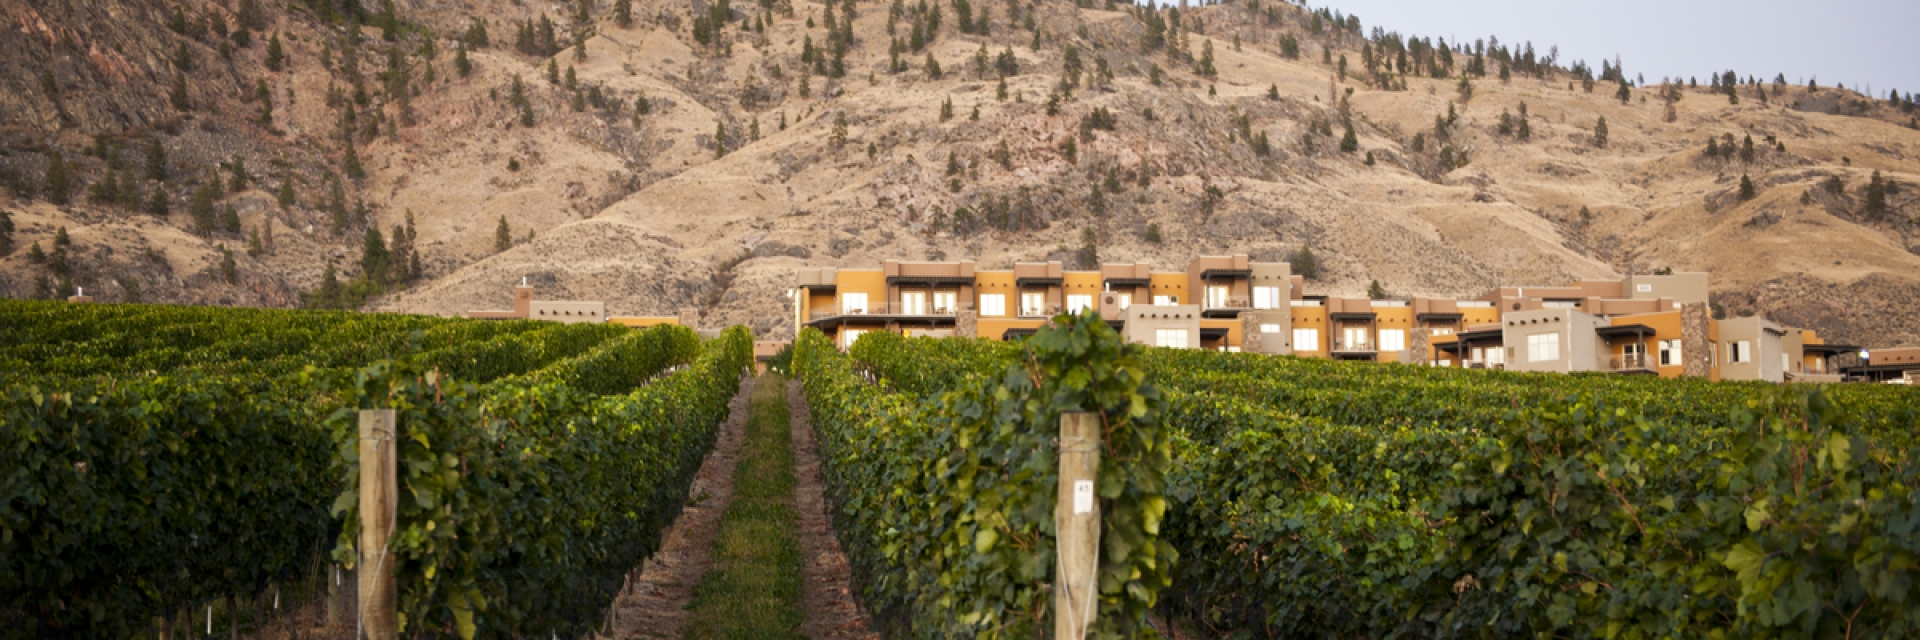 A vineyard in Thompson Okanagan, British Columbia